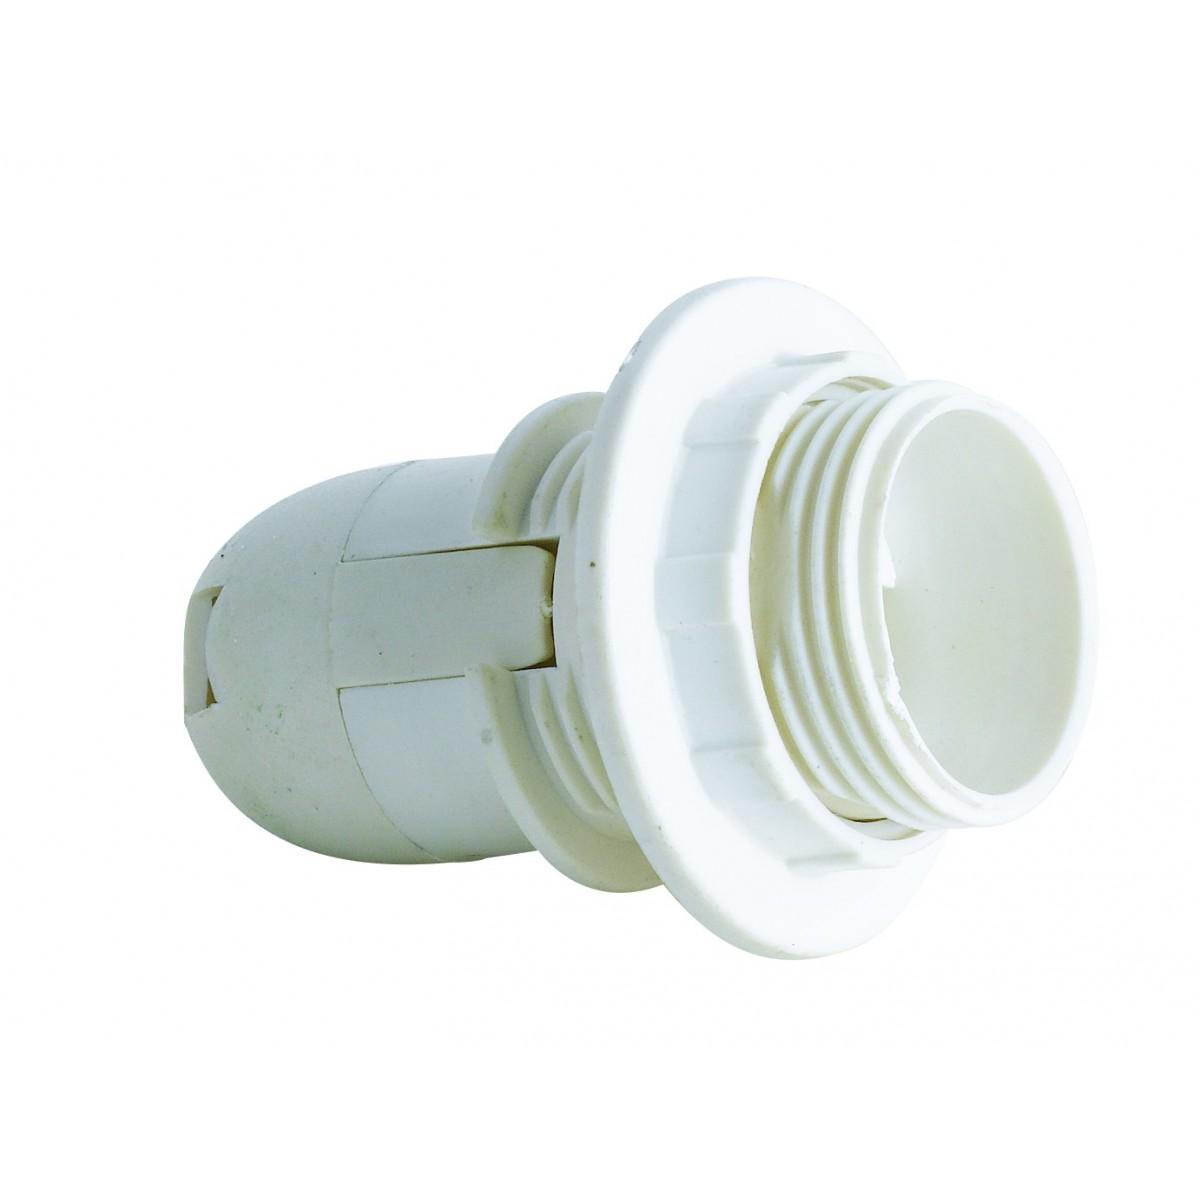 I-LAMPHOLDER-E14-T - Douille avec demi-anneau E14